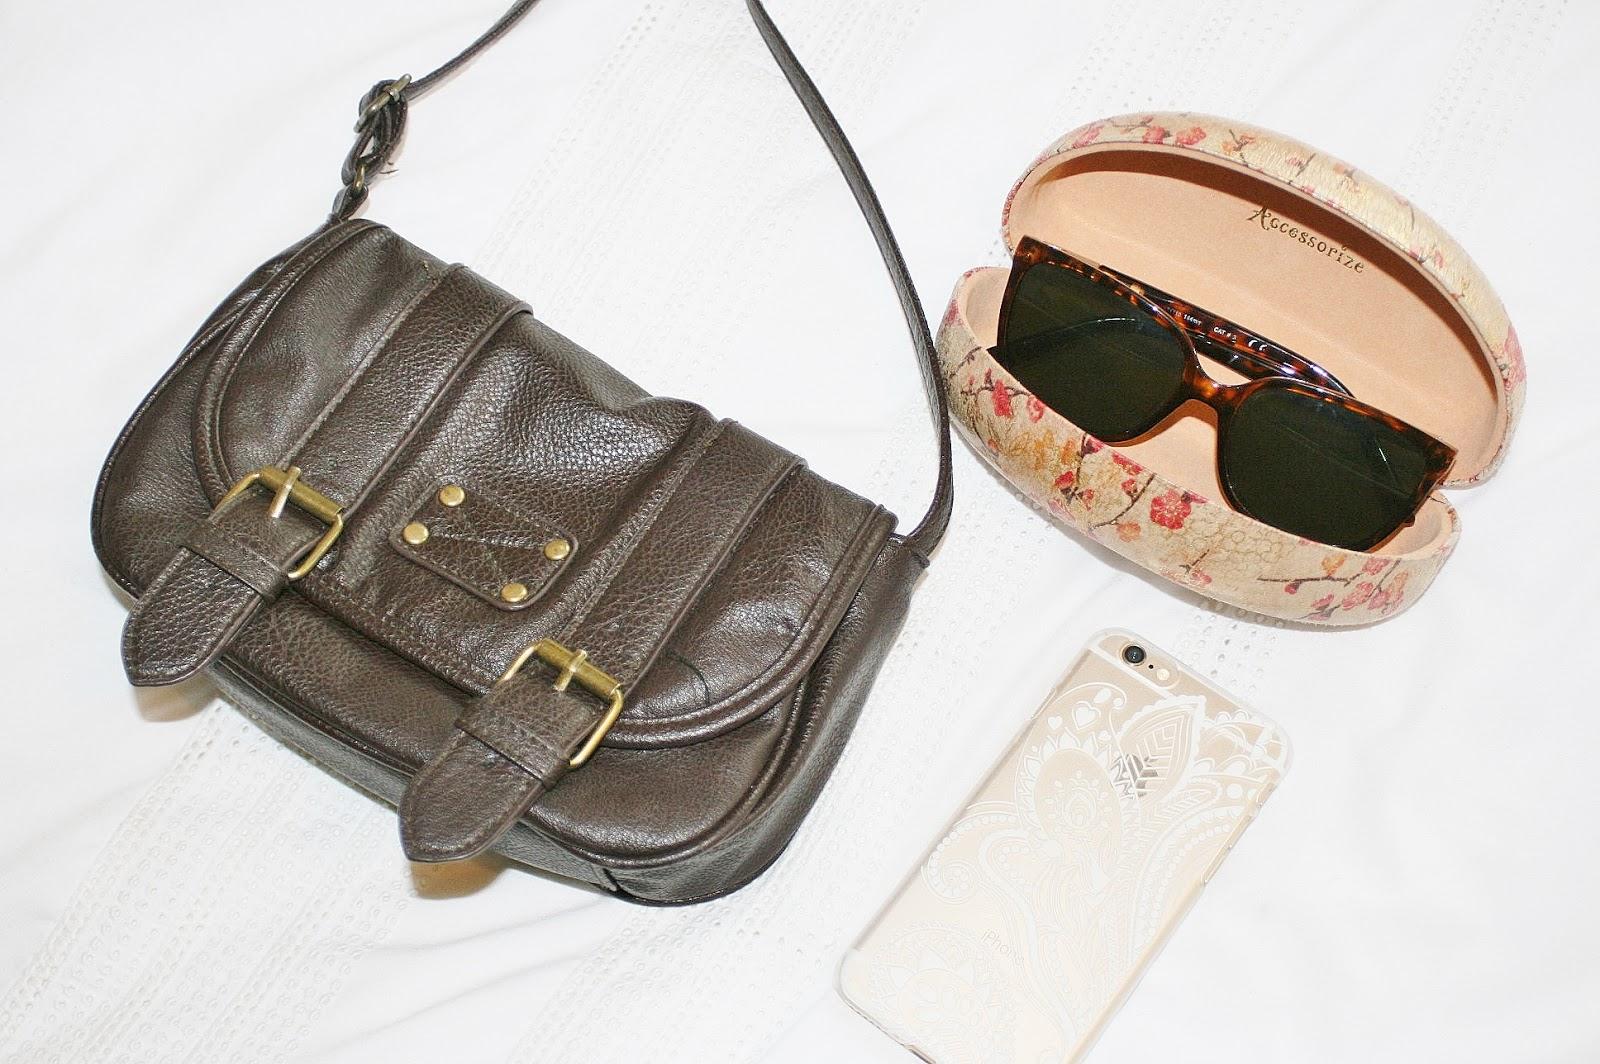 Katherine Penney Chic Pretty accessories sunglasses handbag phone satchel